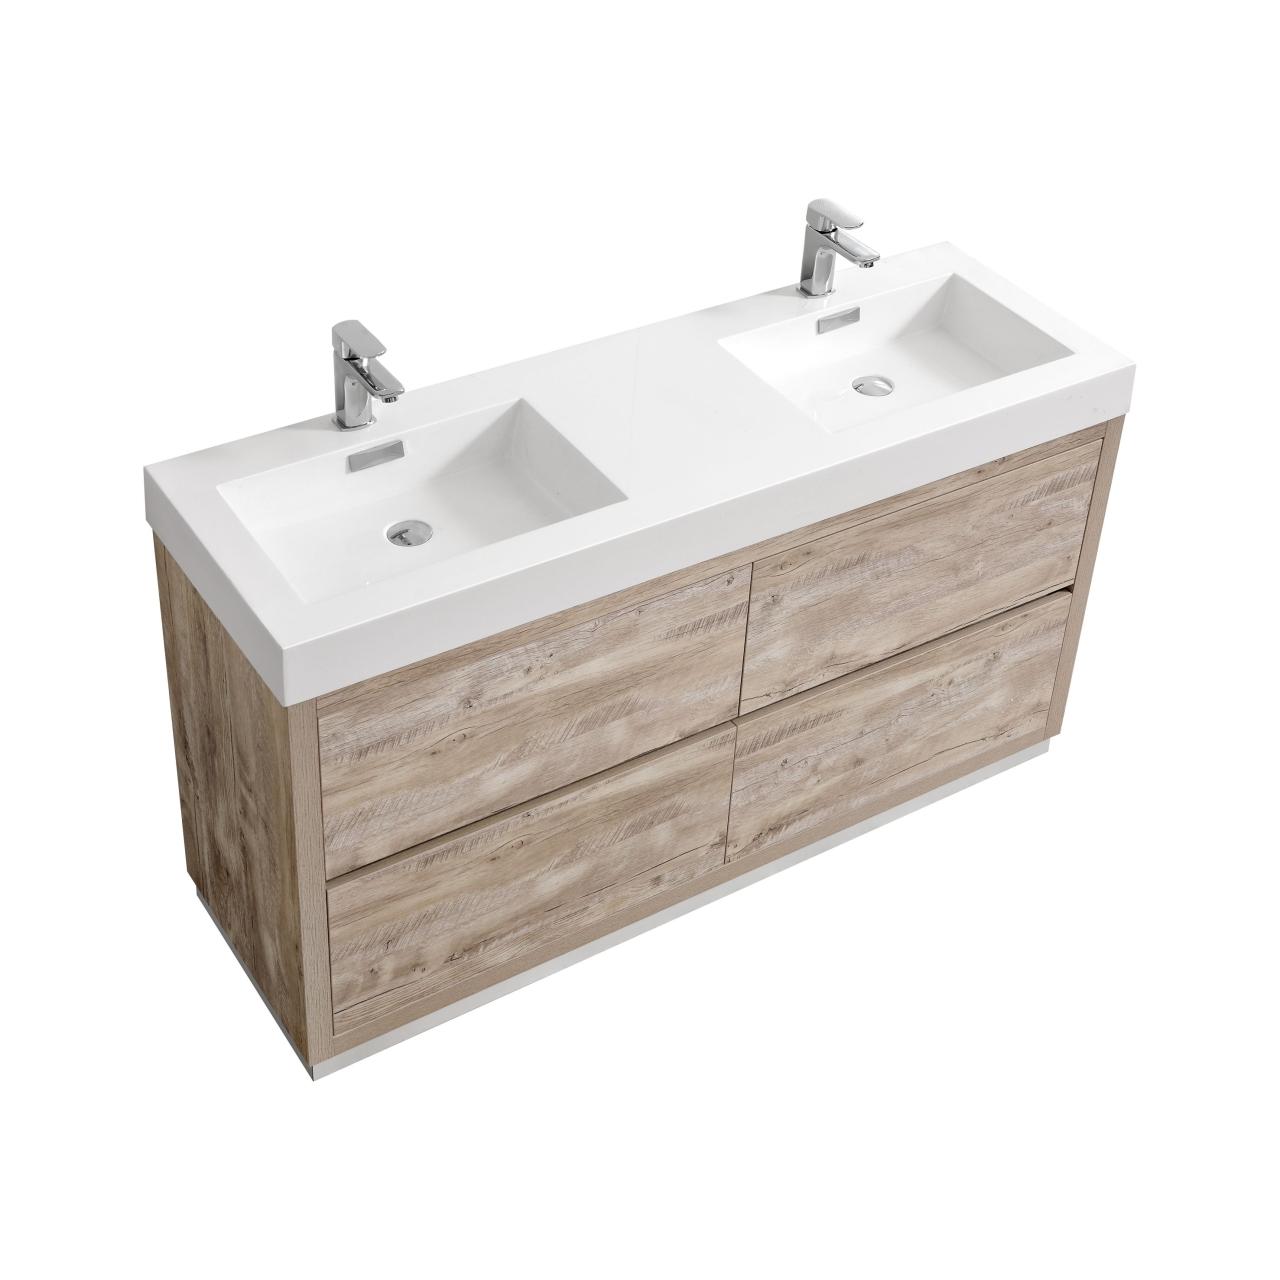 "Bliss 60"" Nature Wood Floor Mount Modern Bathroom Vanity"